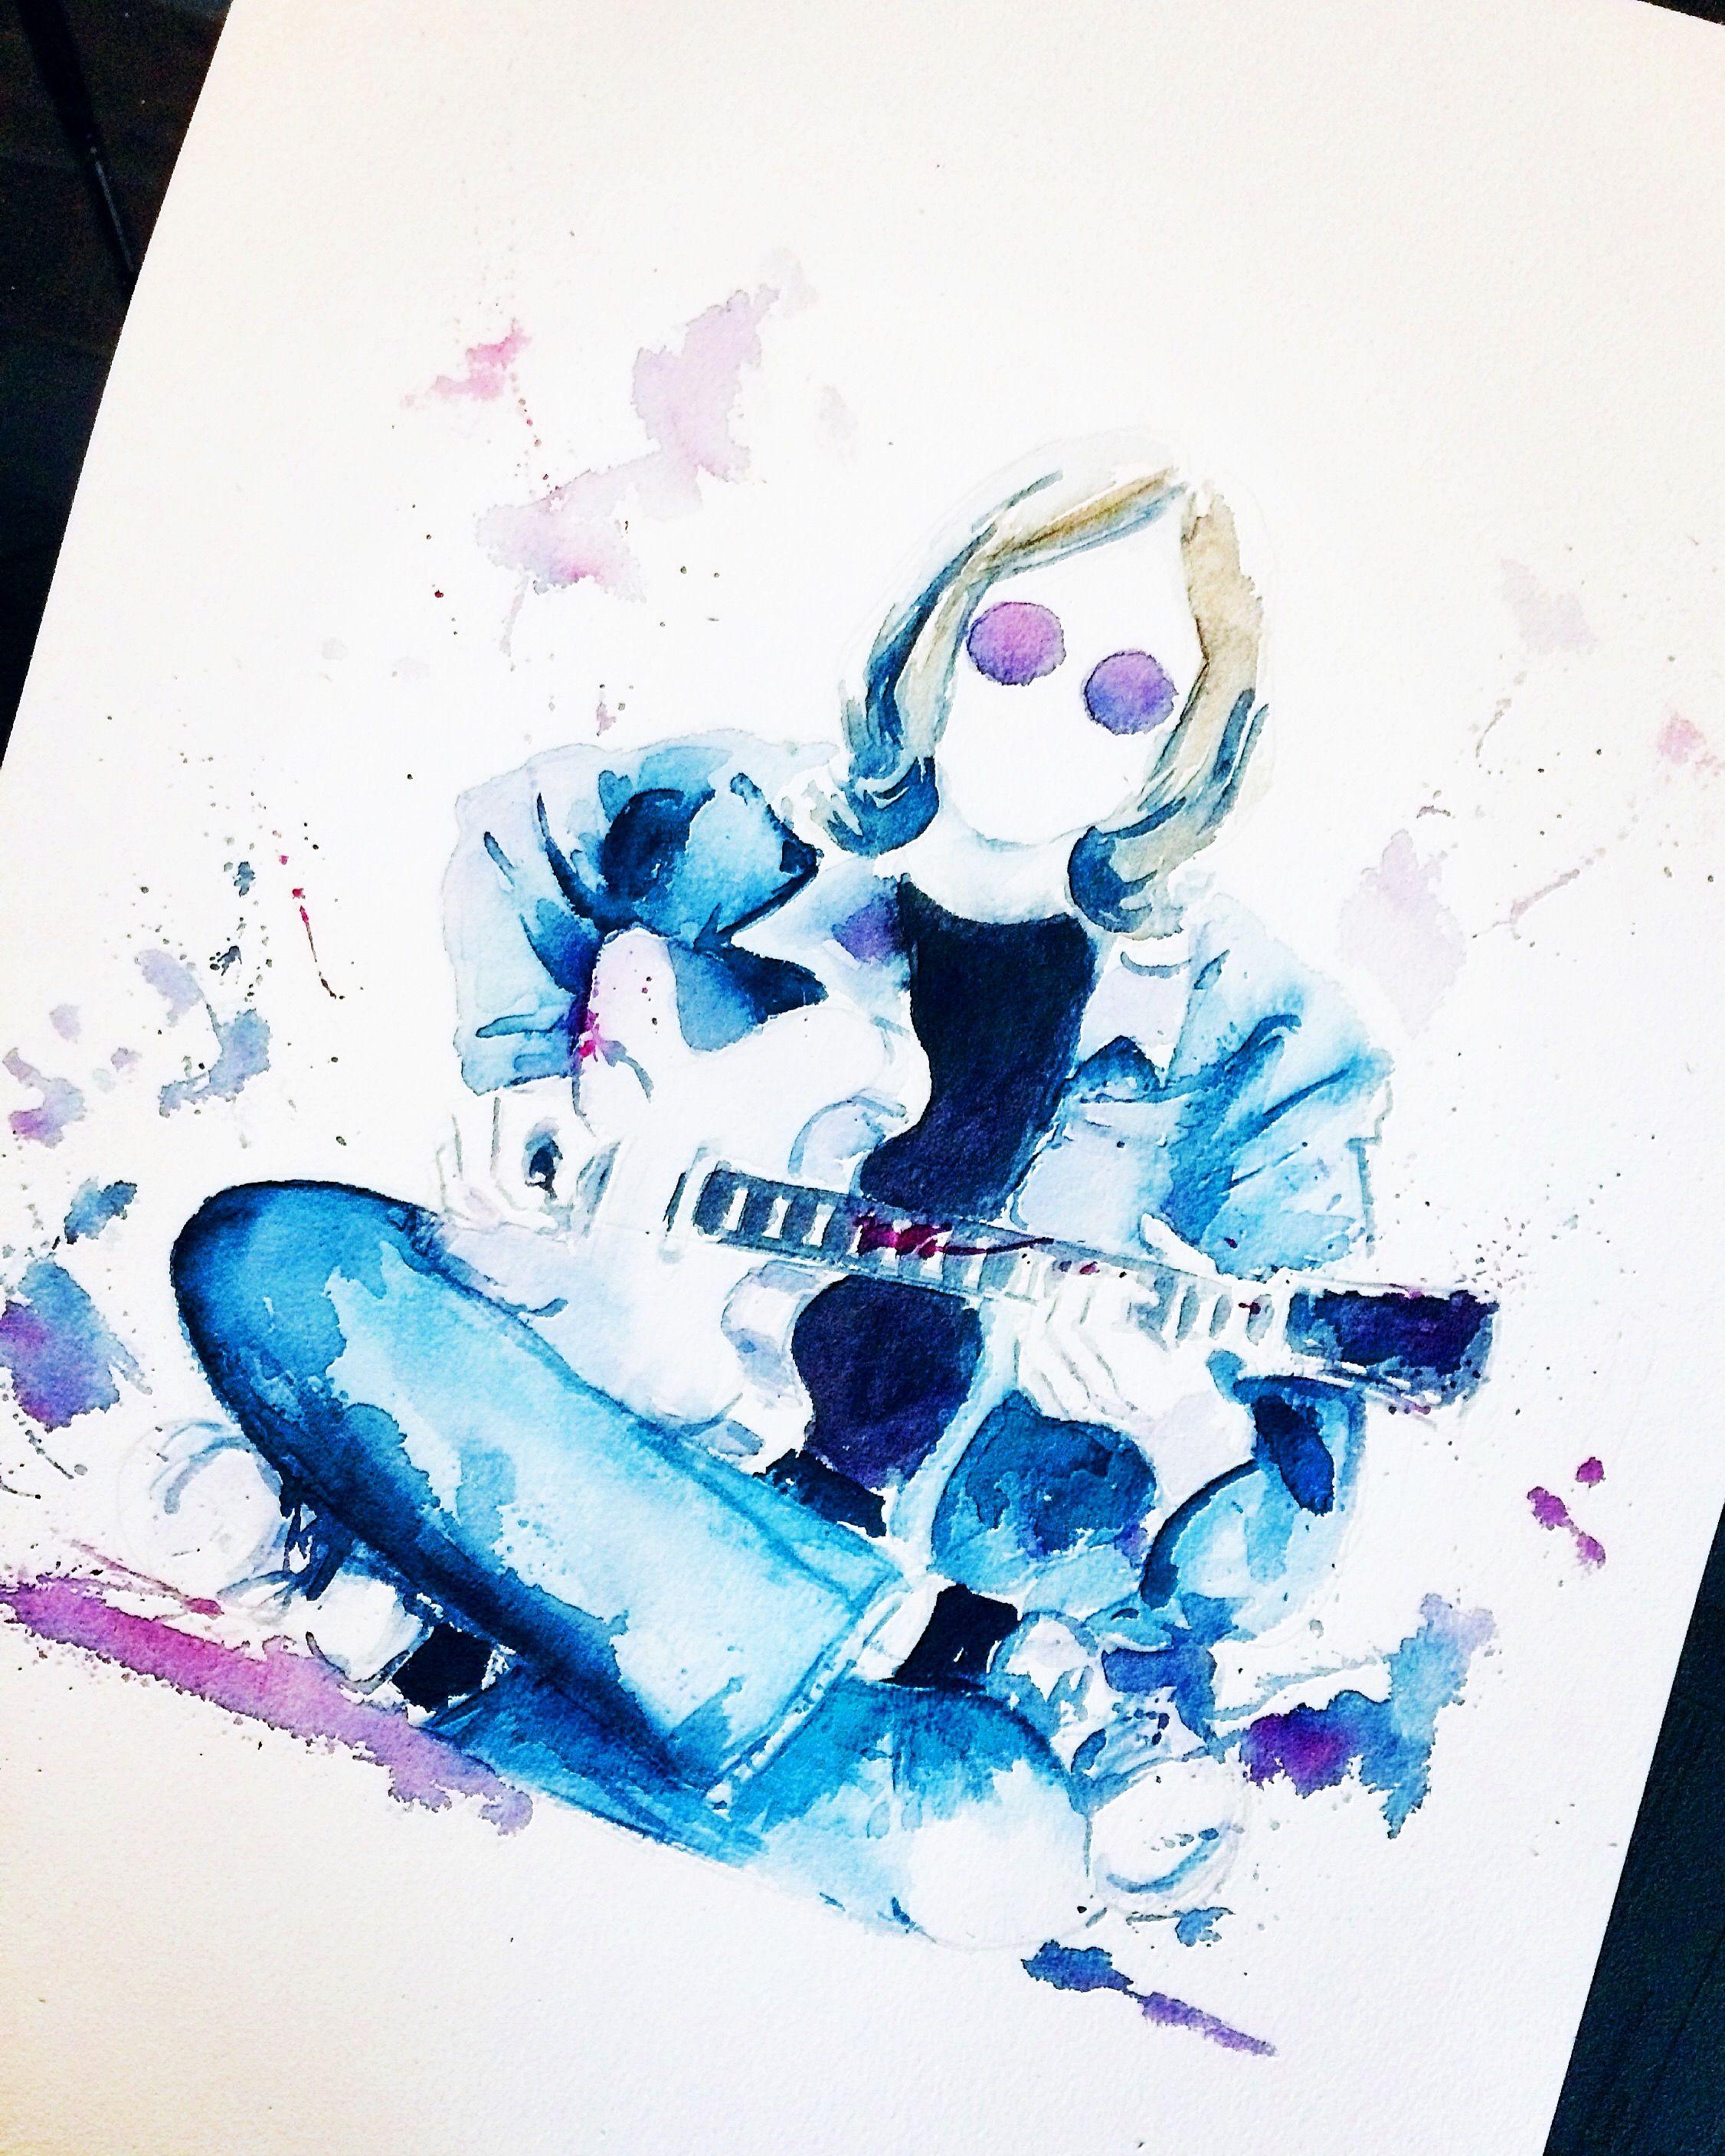 Watercolor Illustration John Lennon The Beatles En 2020